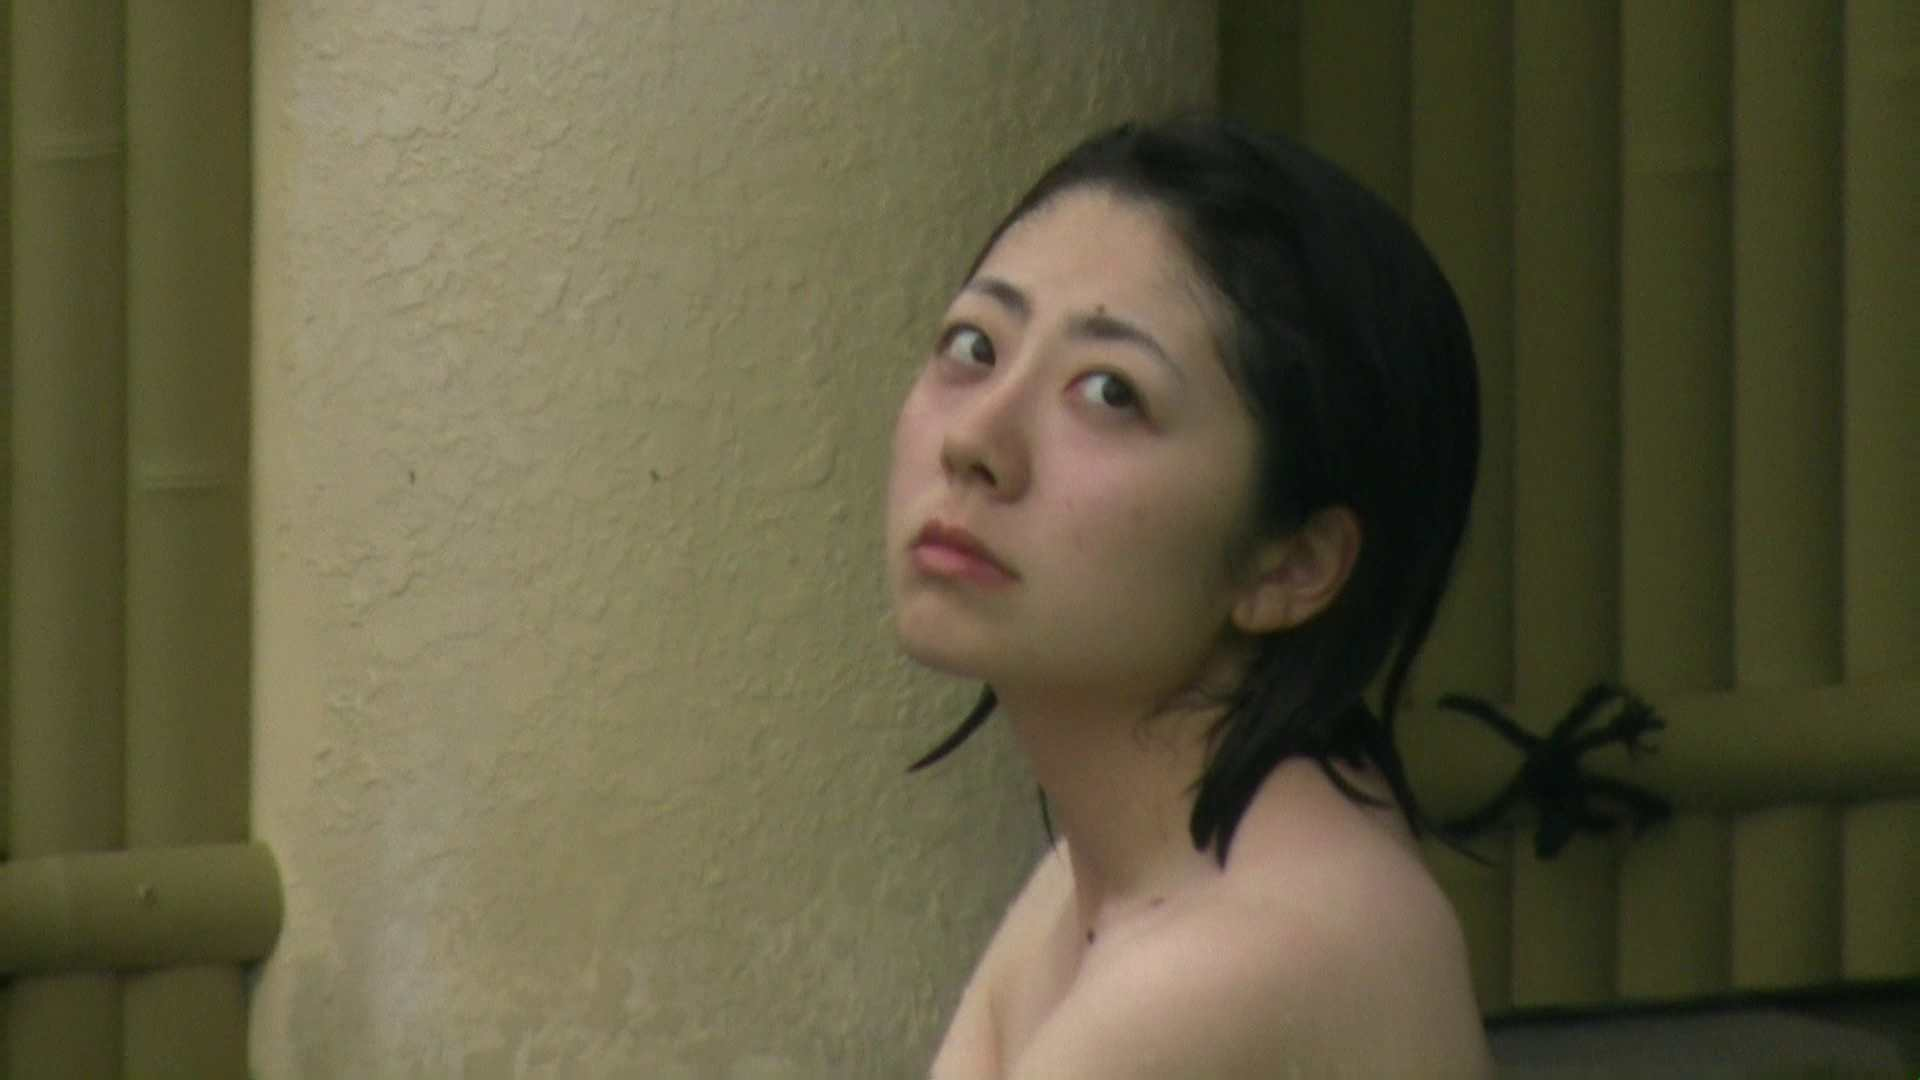 Aquaな露天風呂Vol.04 露天風呂編  94PIX 2